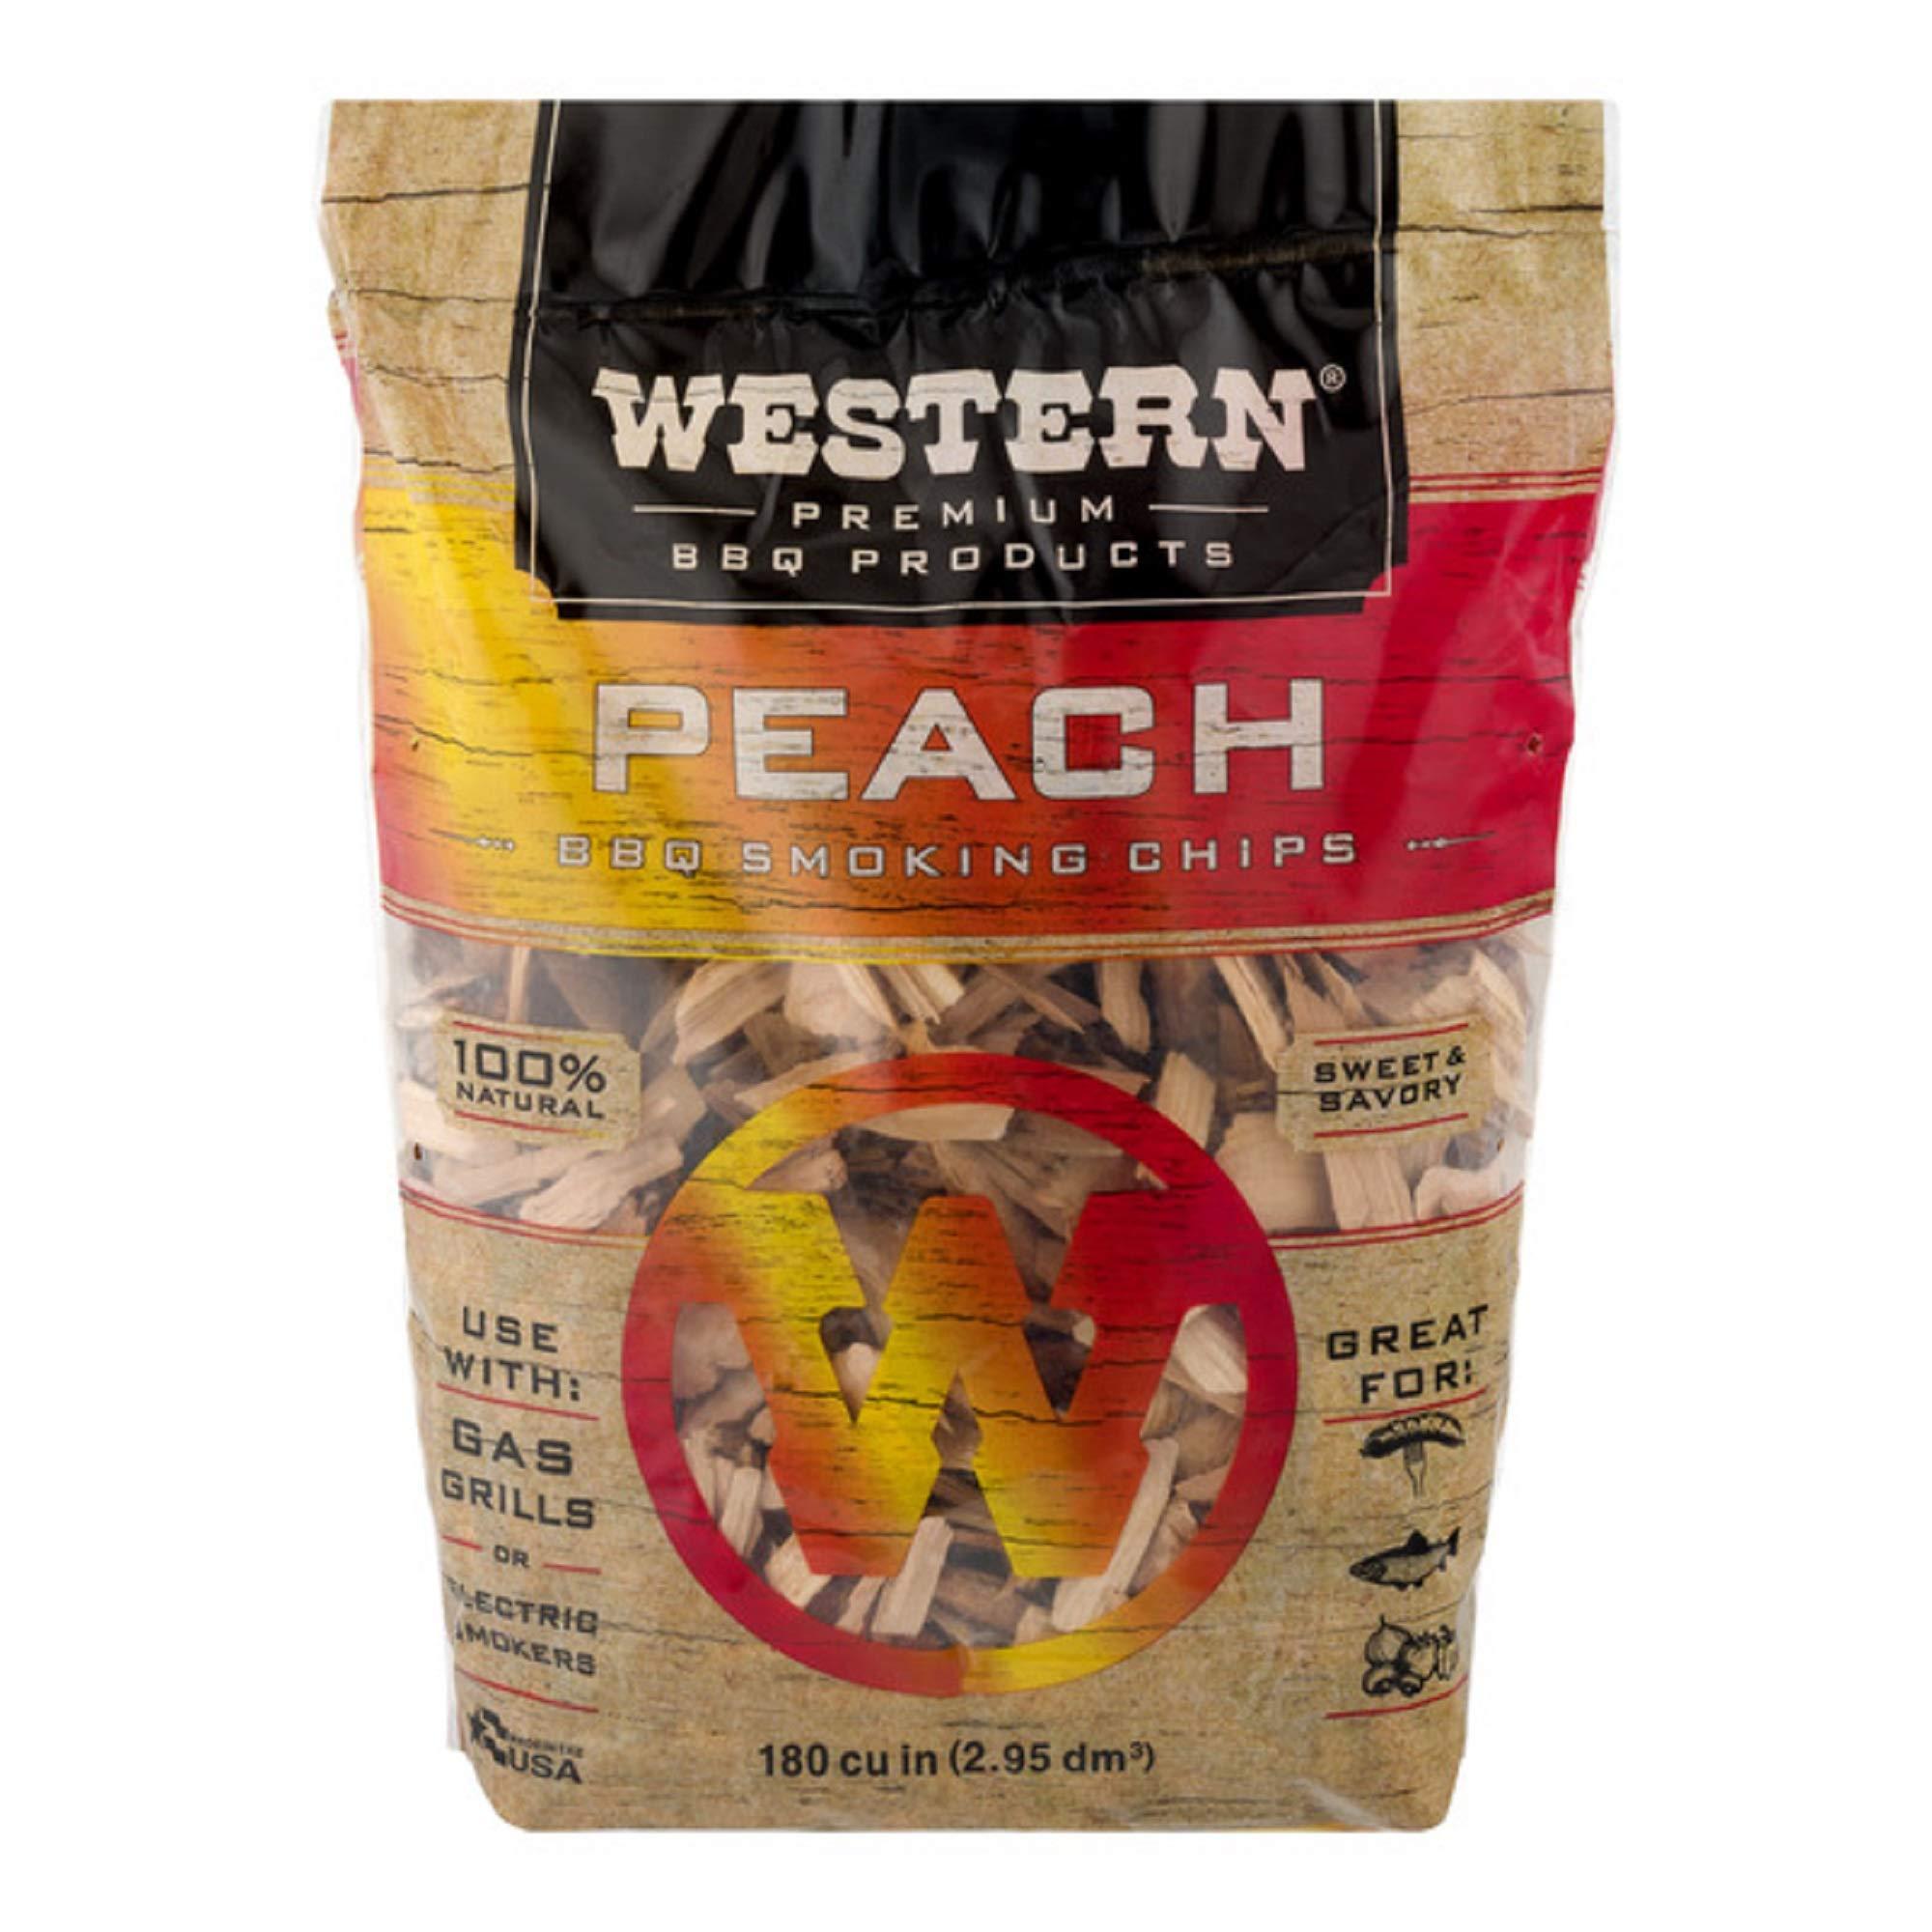 Western Premium BBQ Products Peach BBQ Smoking Chips, 180 cu in